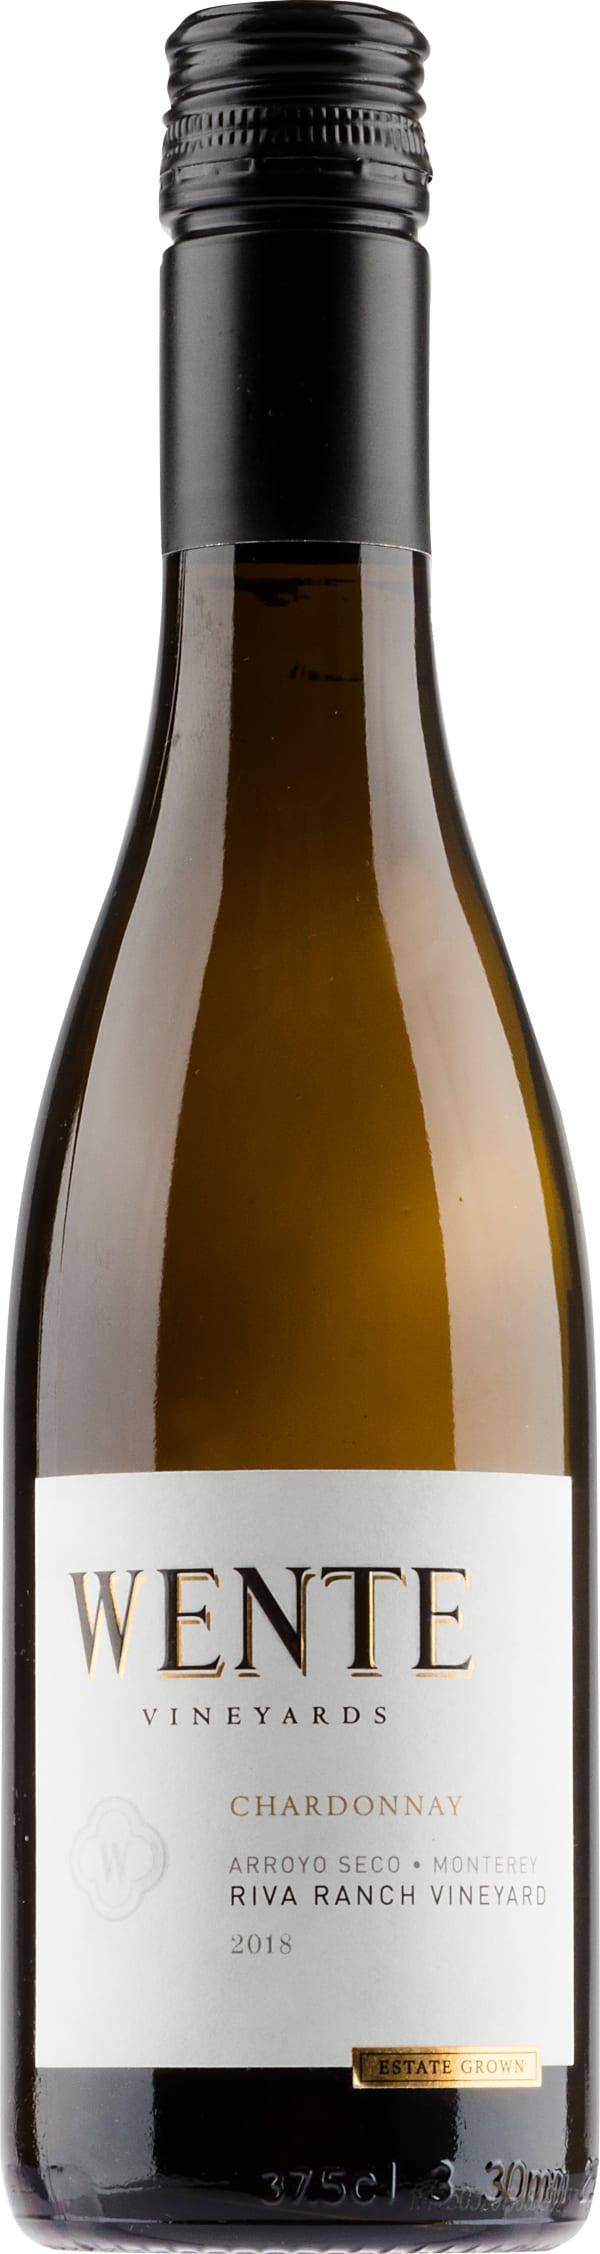 Wente Riva Ranch Chardonnay 2019